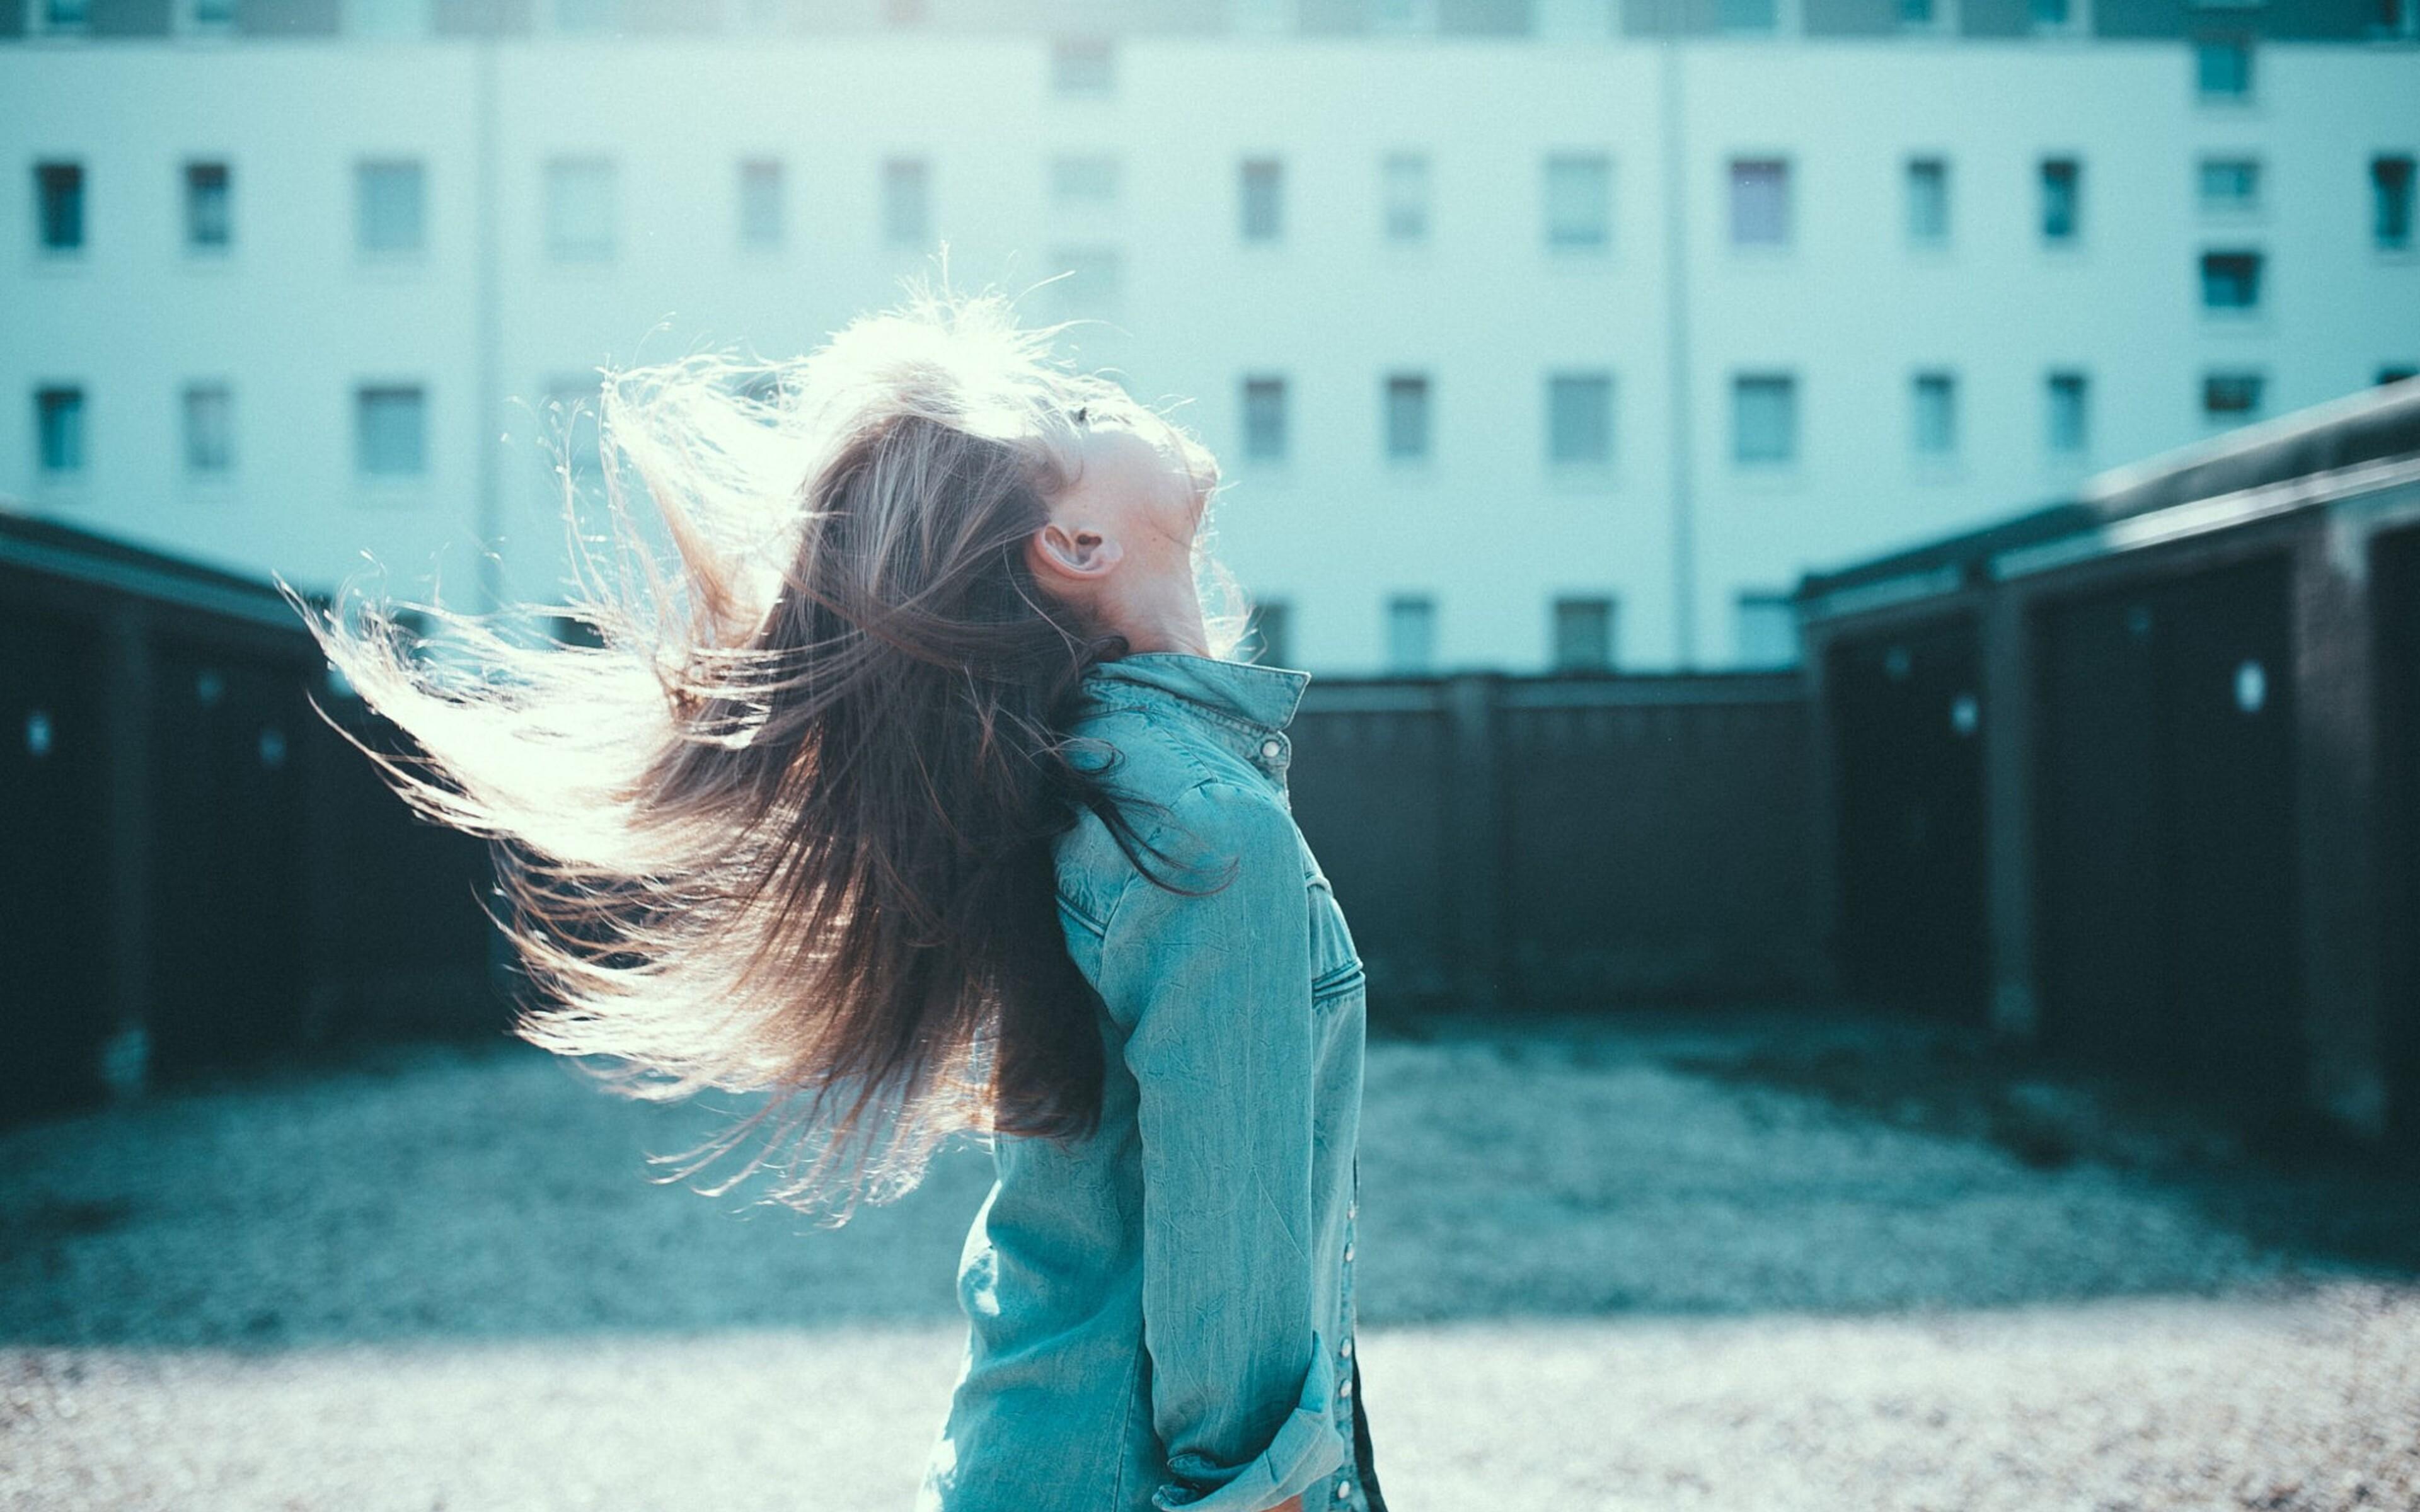 girl-hairs-in-air.jpg